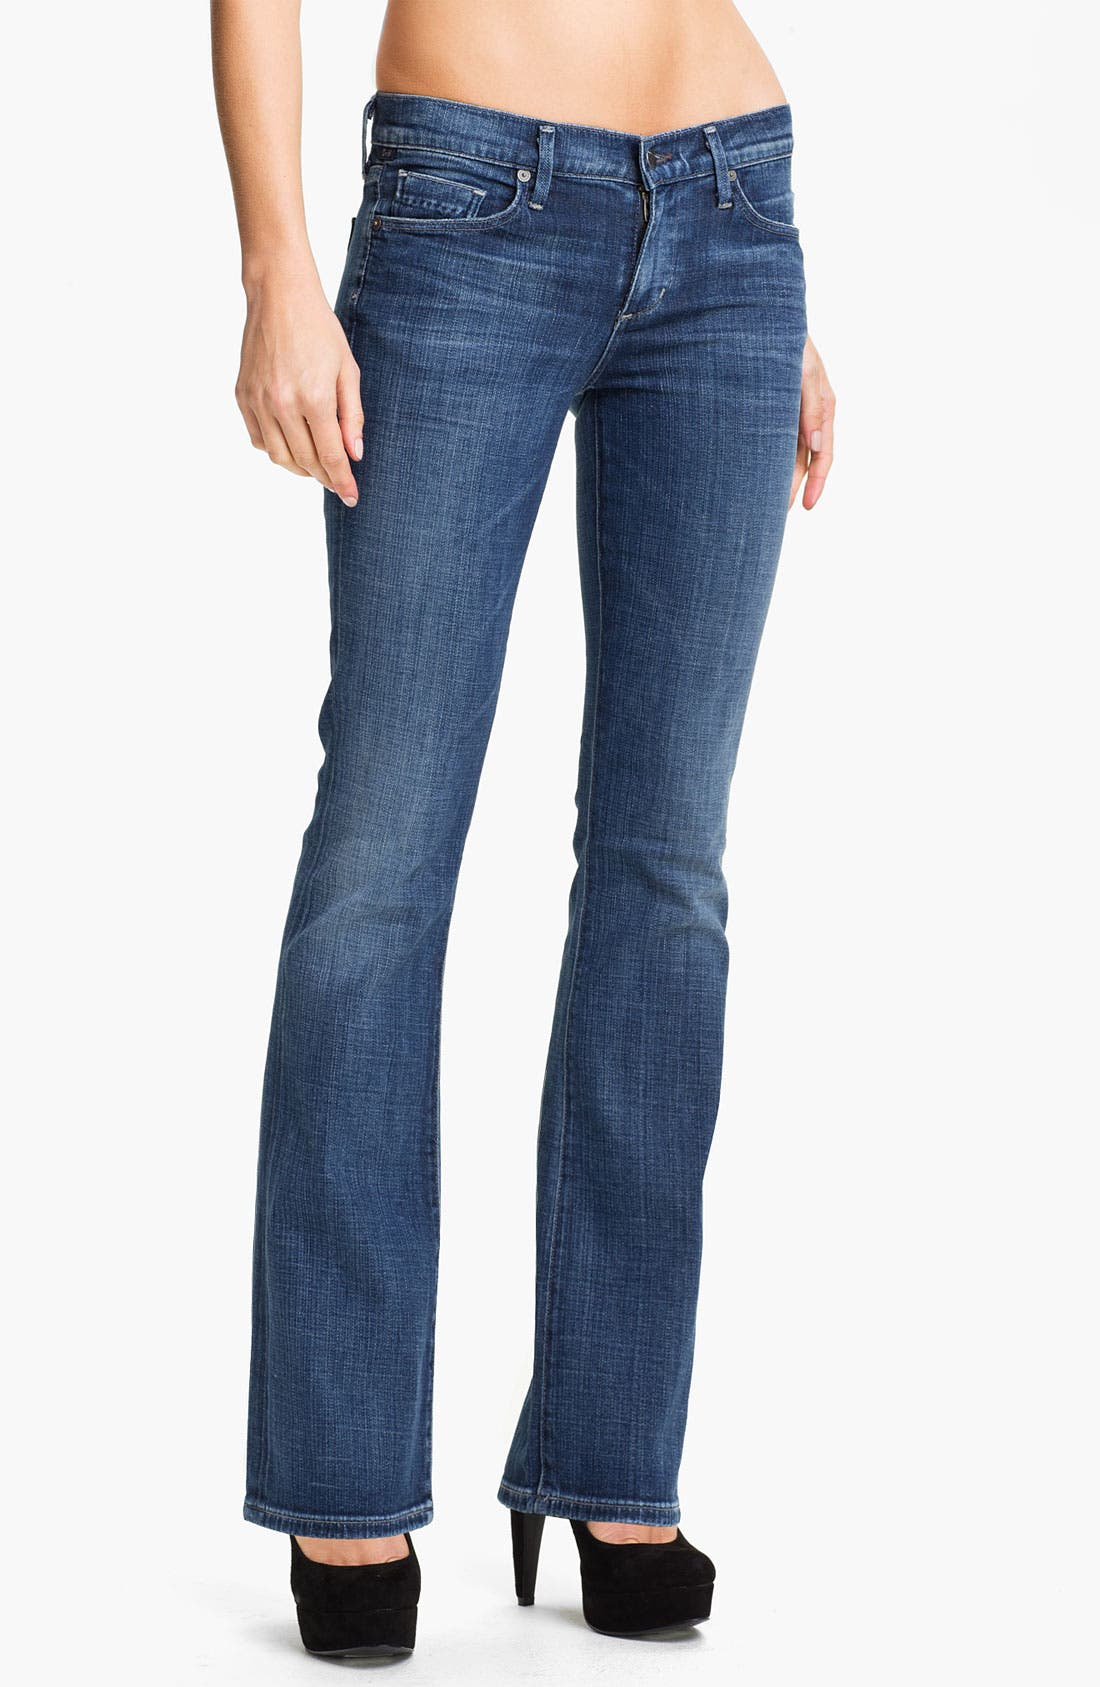 Alternate Image 1 Selected - Citizens of Humanity 'Dita' Slim Bootcut Jeans (Wedgewood) (Petite)